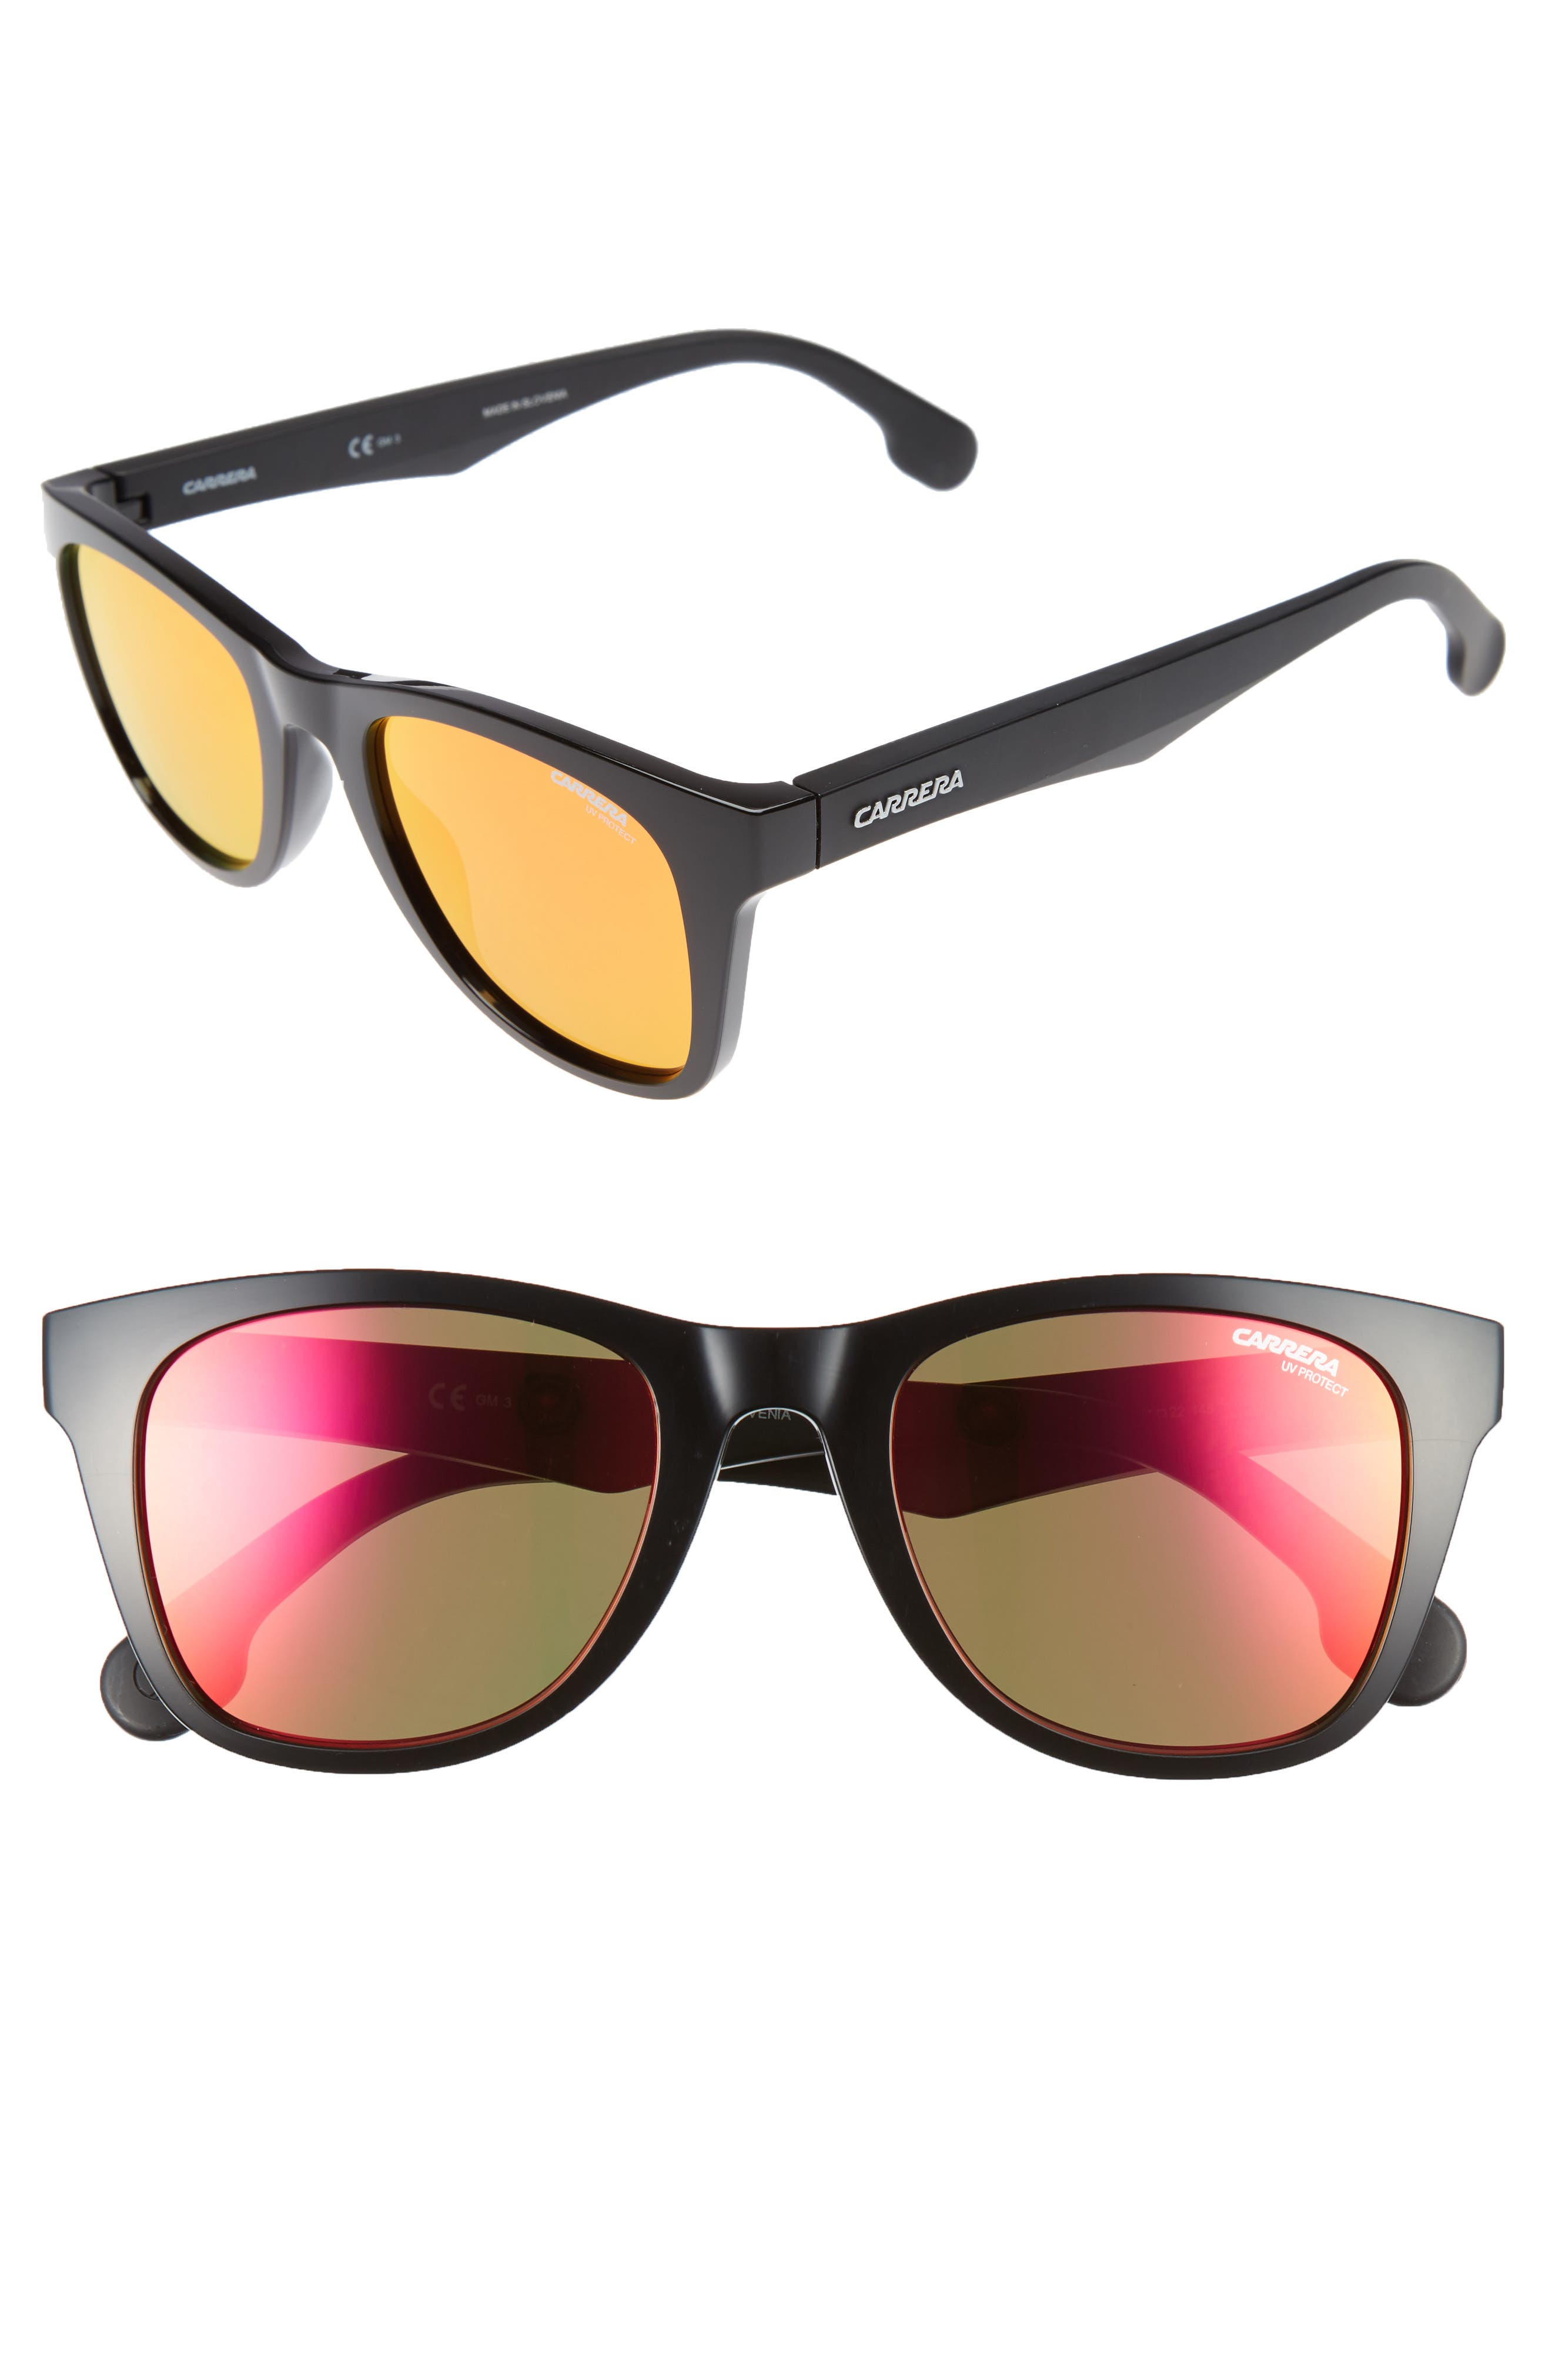 Main Image - Carrera Eyewear 51mm Sunglasses